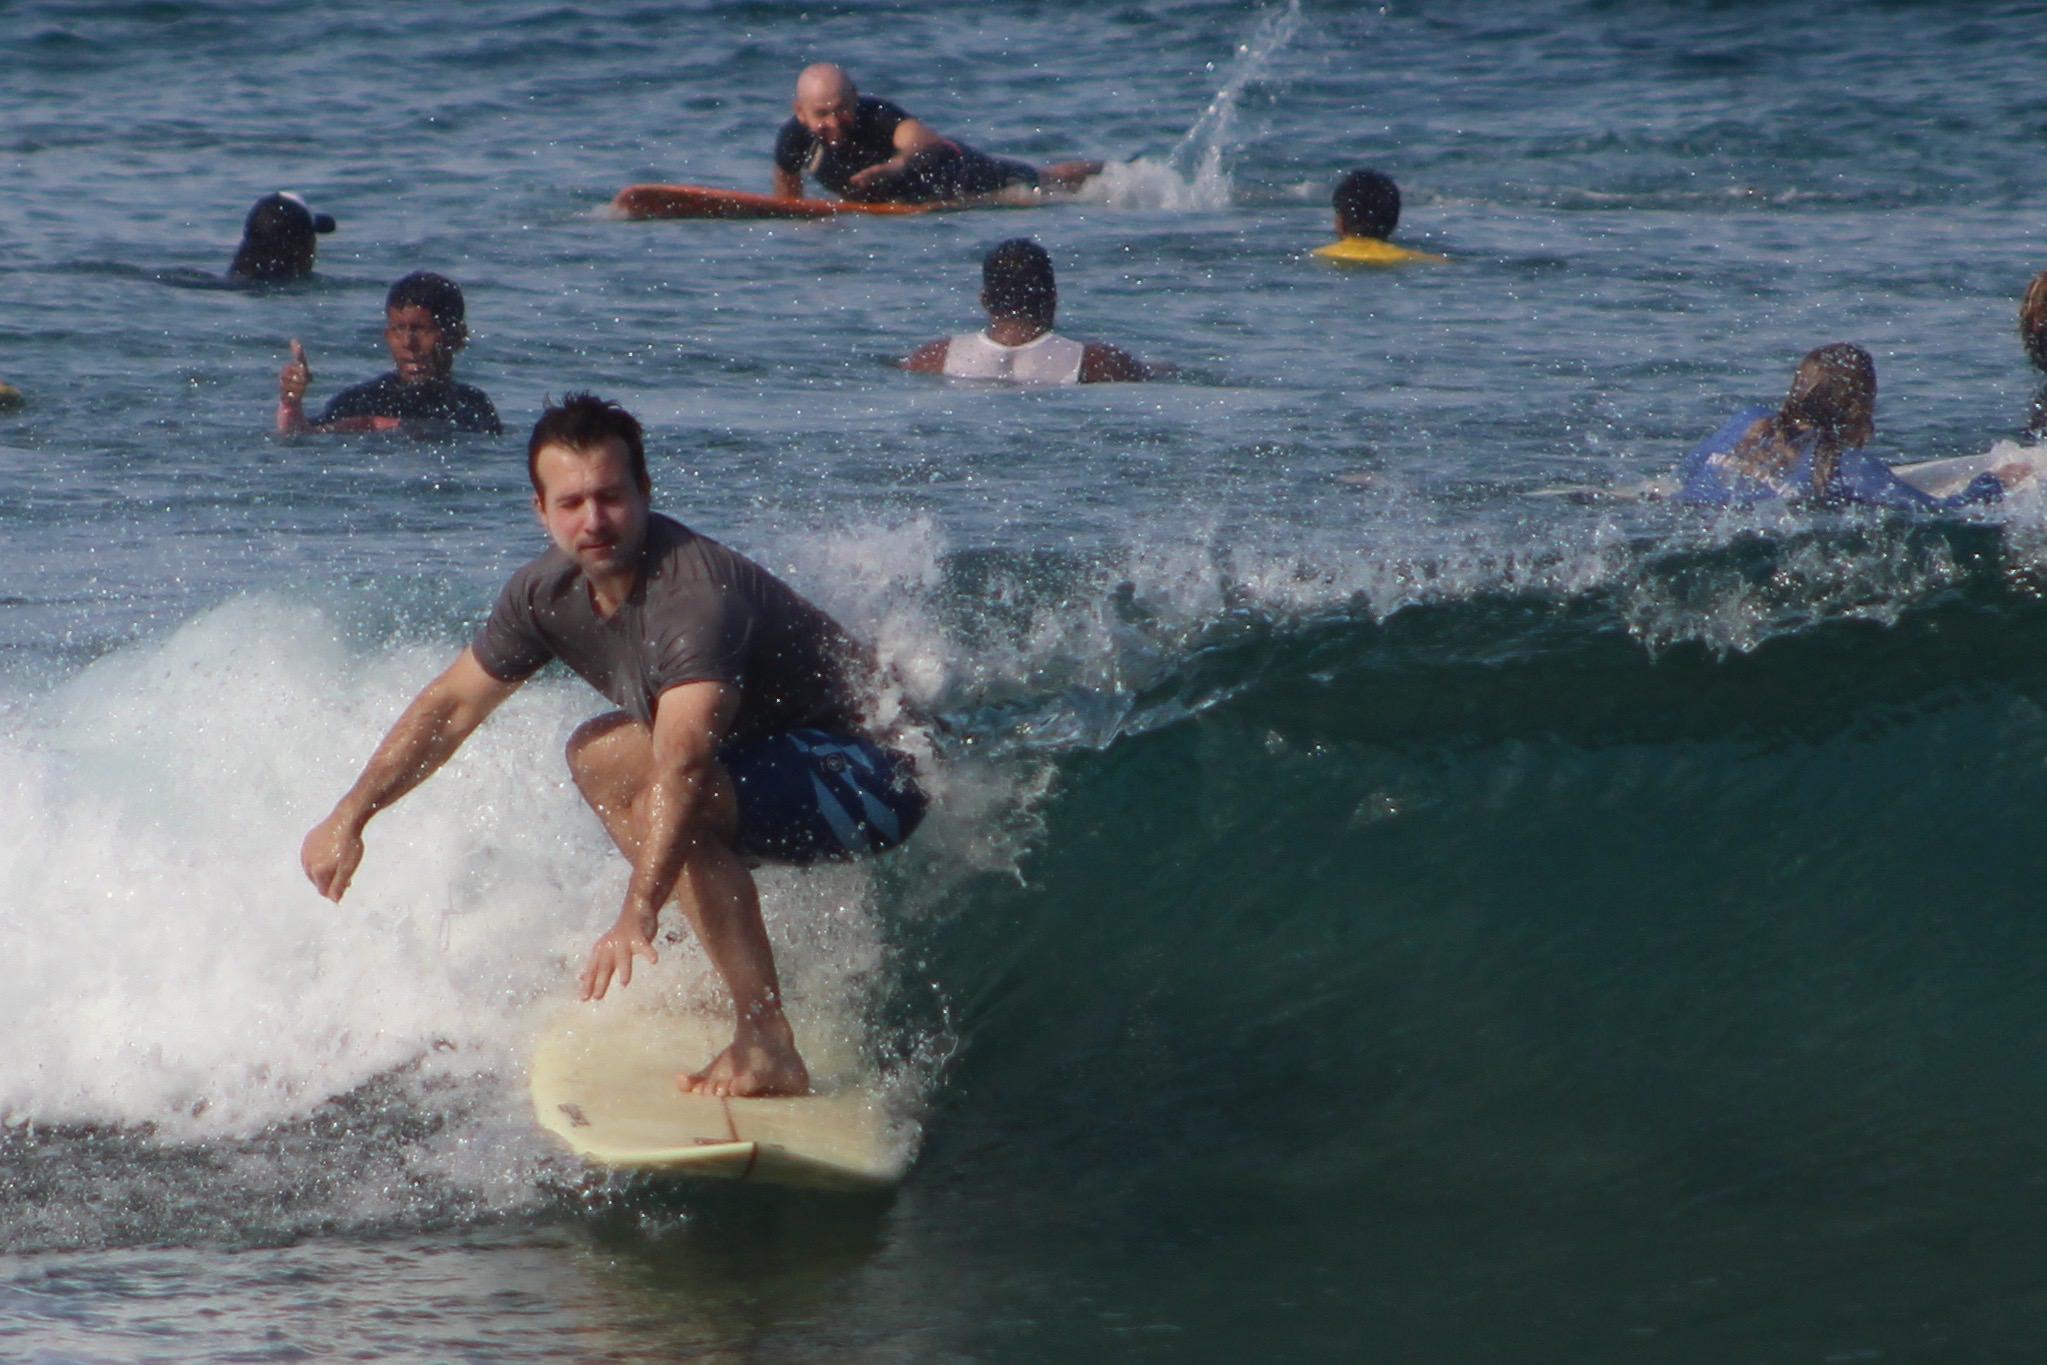 surf-lessons-puerto-escondido copy.jpg